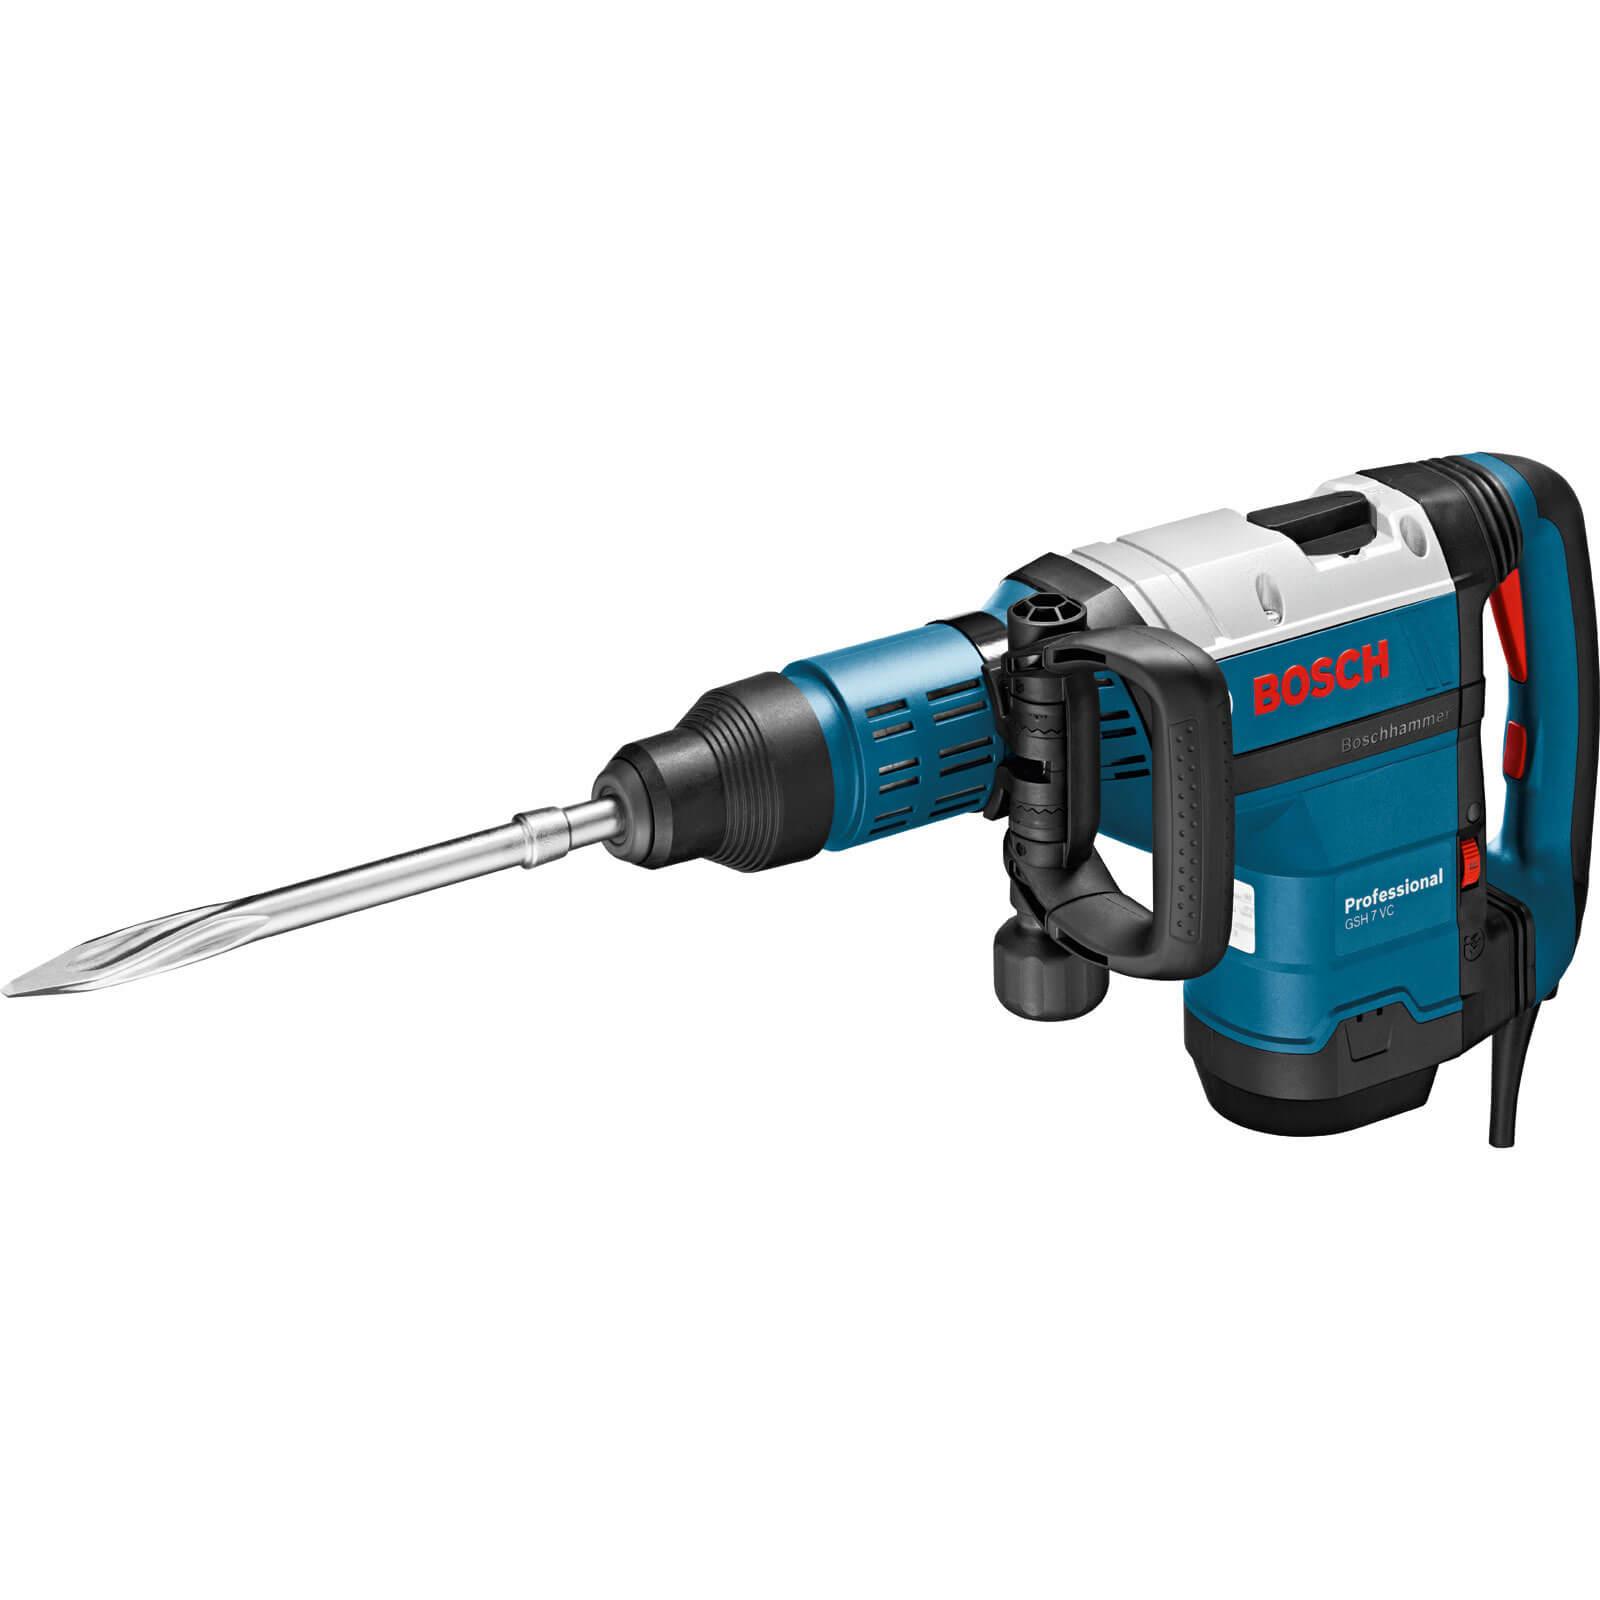 Image of Bosch GSH 7 VC SDS Max Demolition Hammer 110v